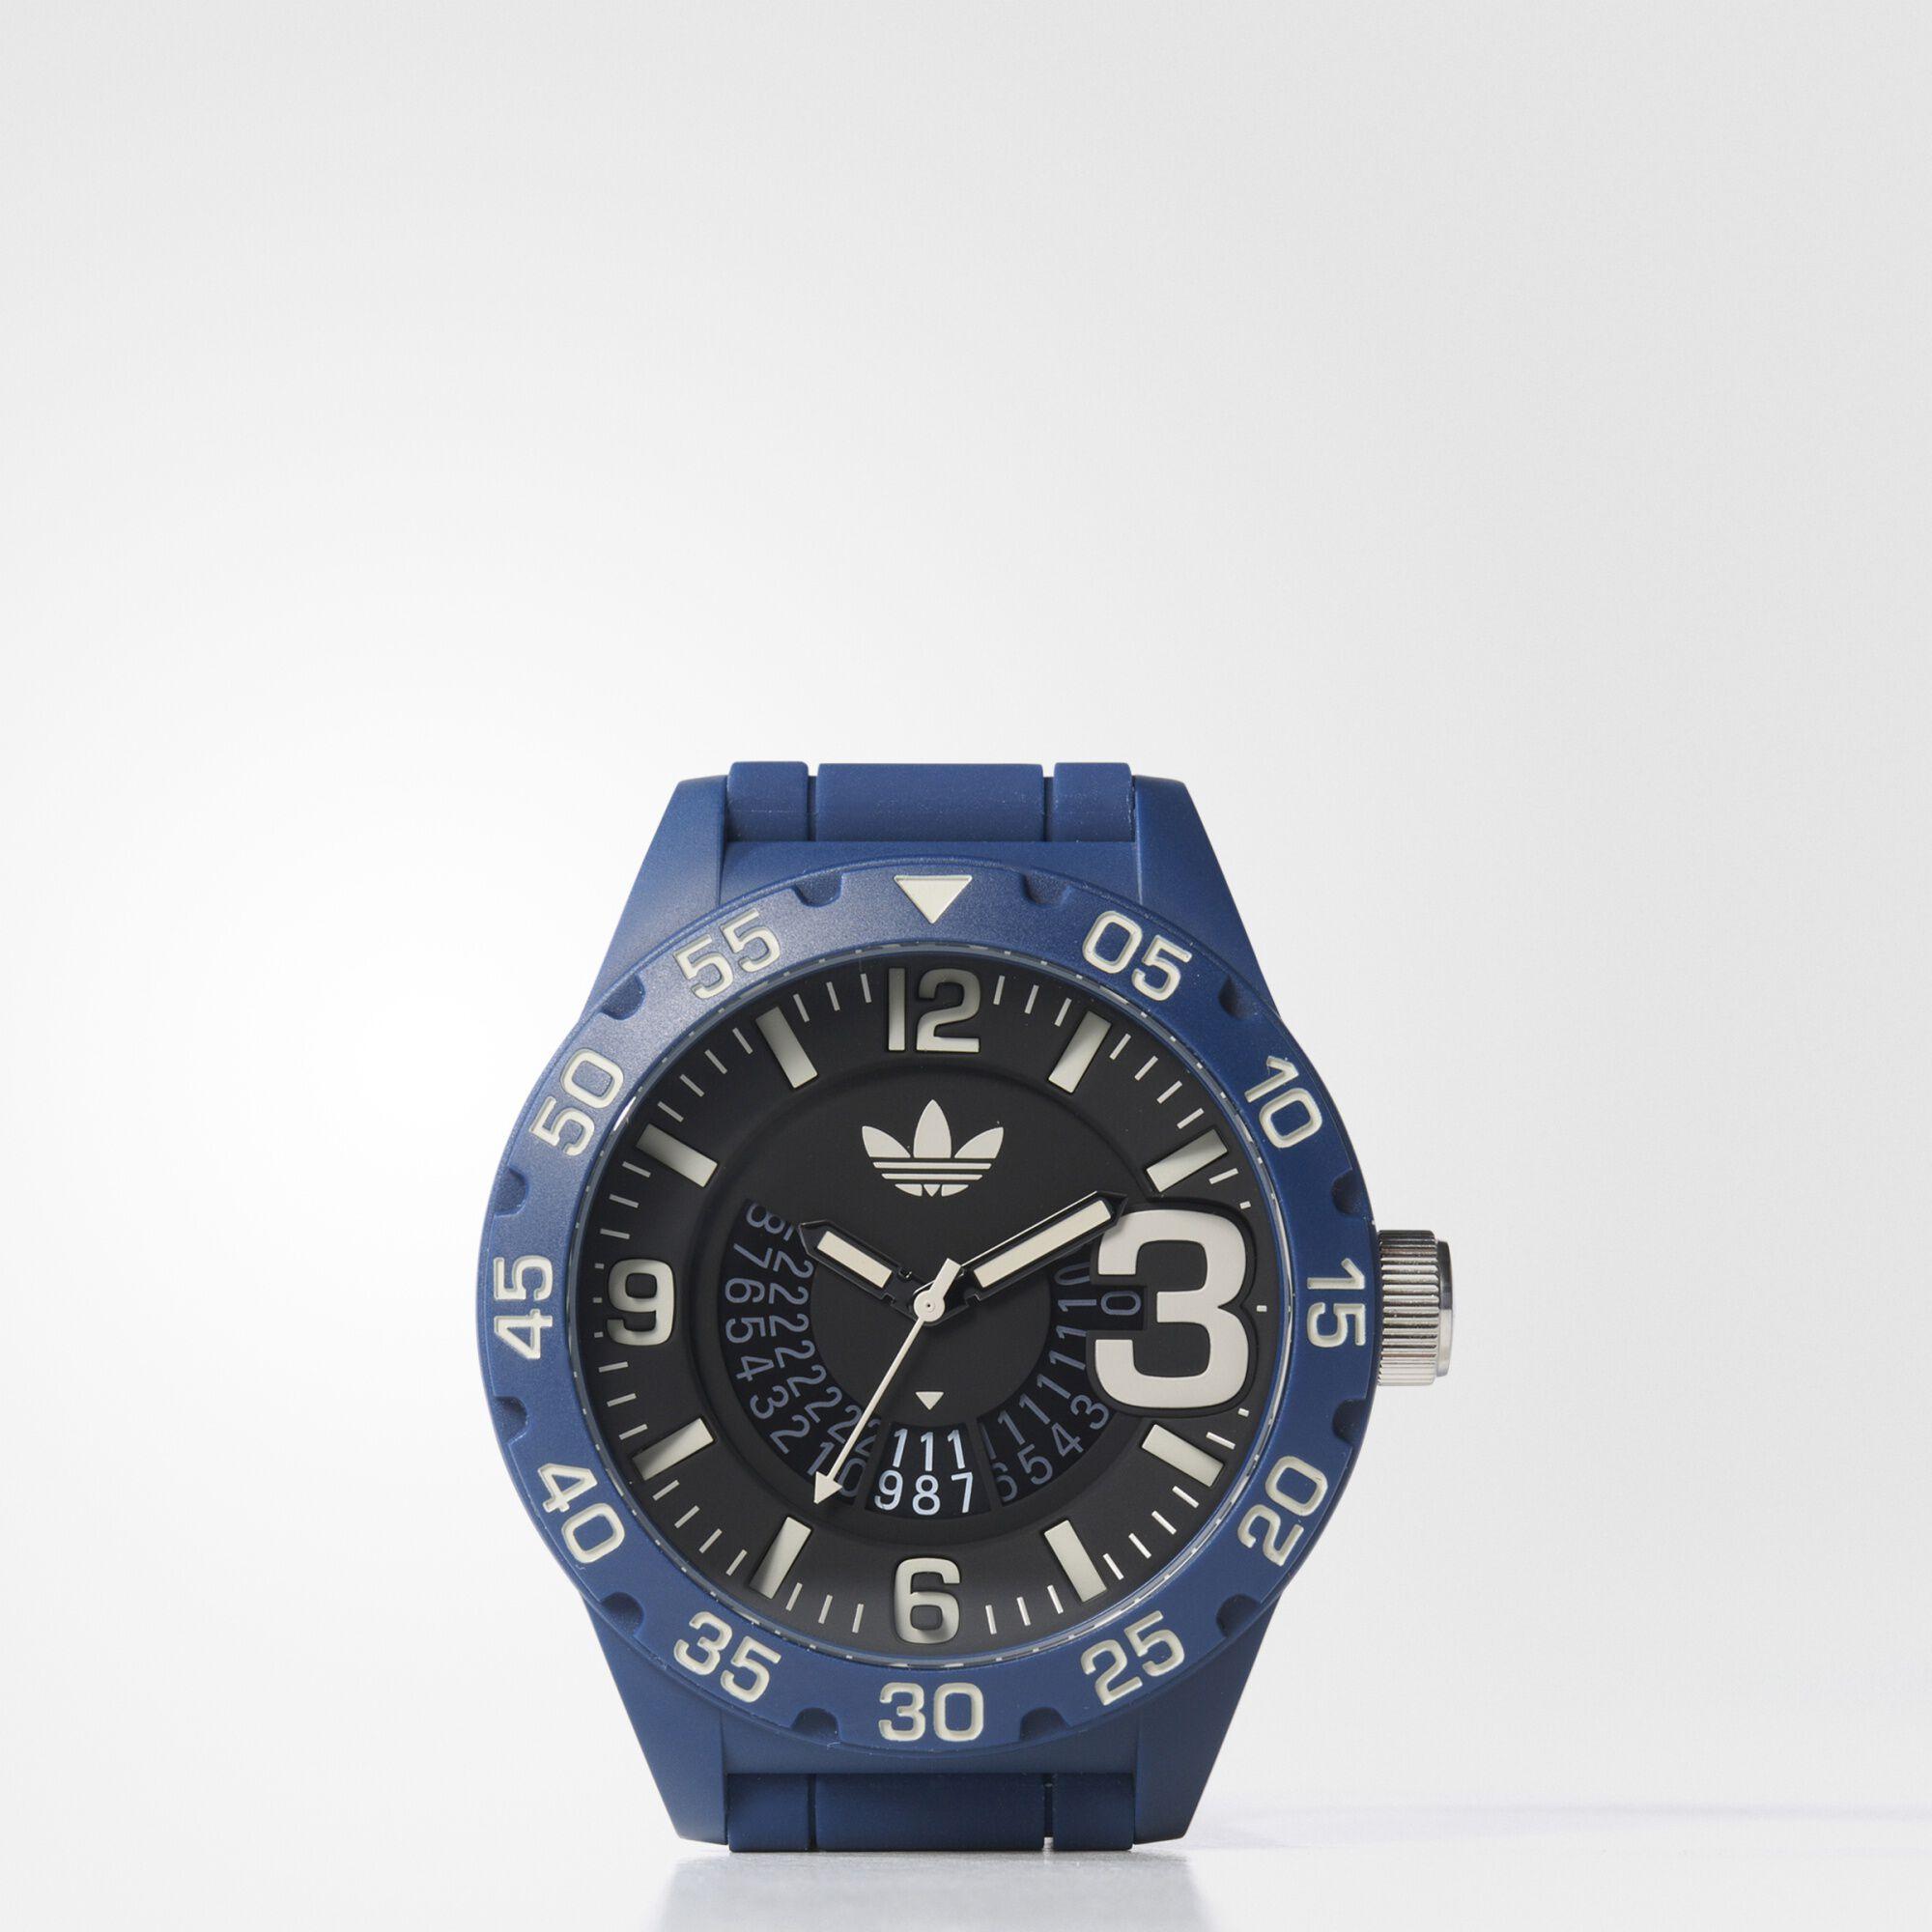 mens sports watch personal tracker fit smart adidas us adidas newburgh watch blue bi1322